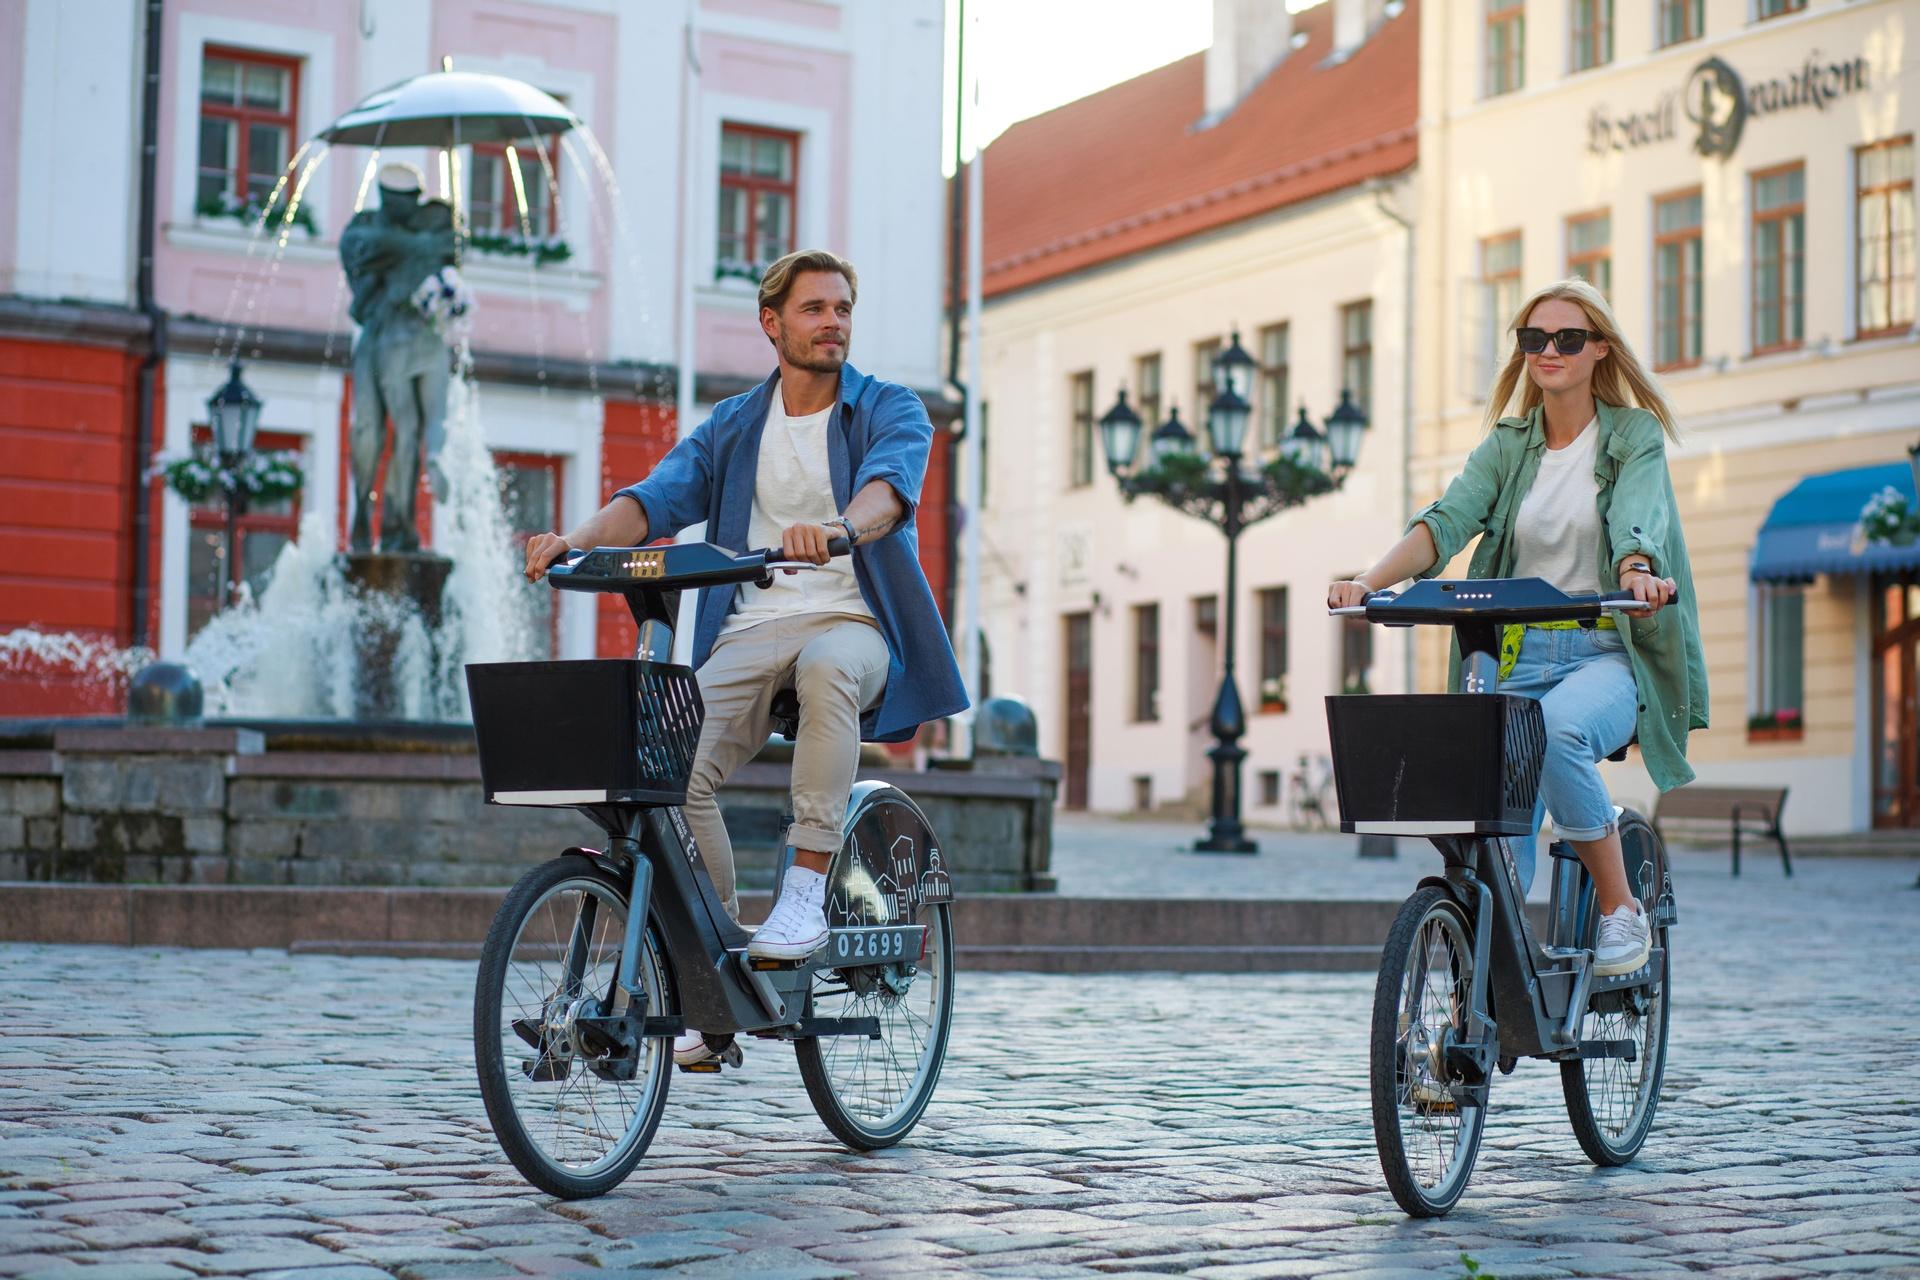 Biking in Tartu